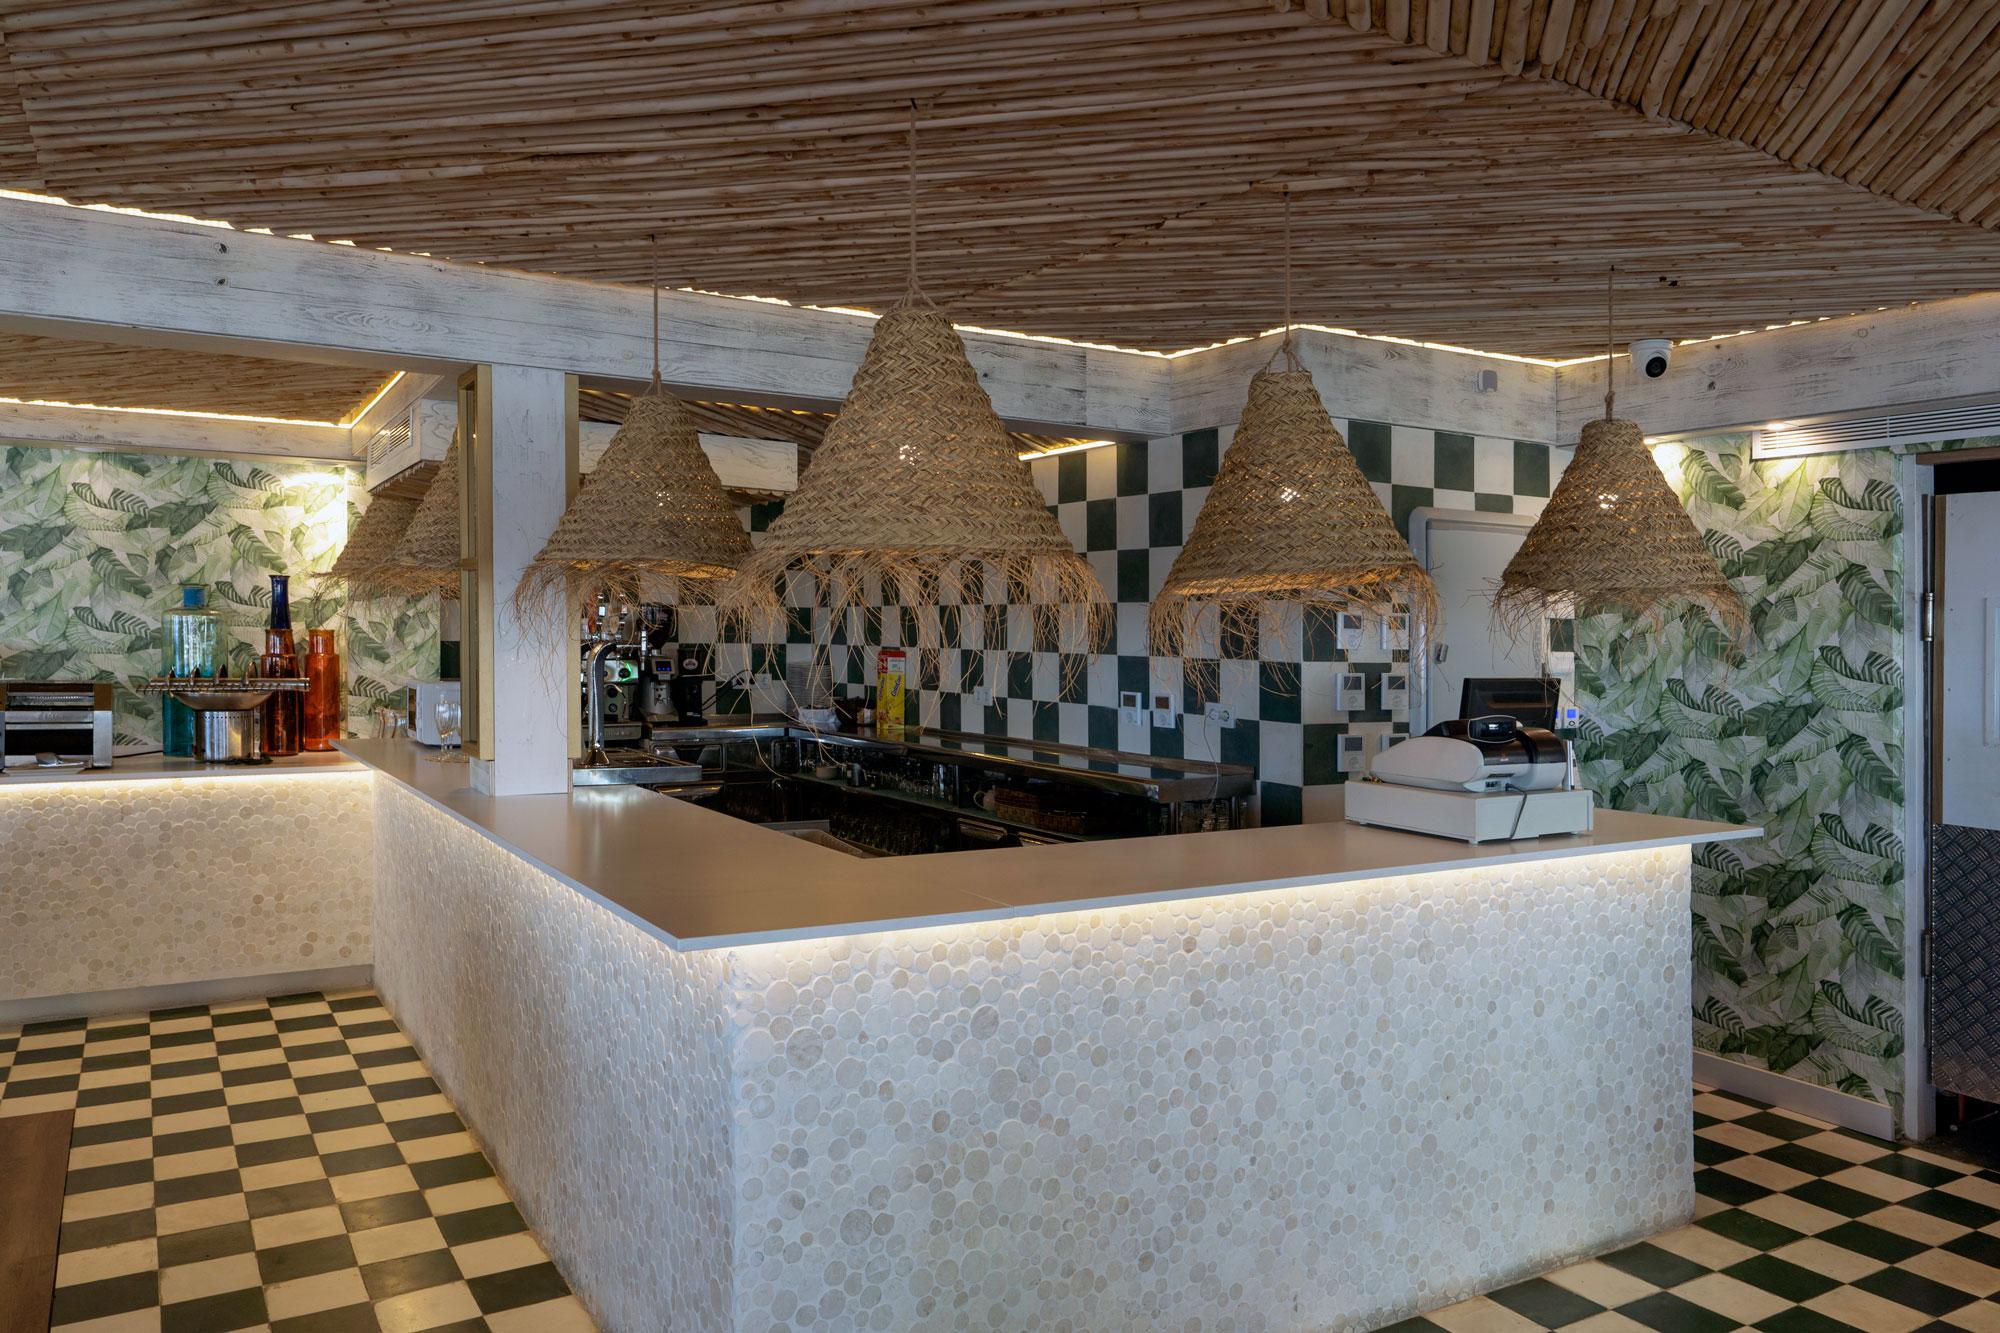 Hotel Mediterráneo  - Hotel Mediterraneo Park 14 Dekton Silestone Piedra Natural Cosentino 61